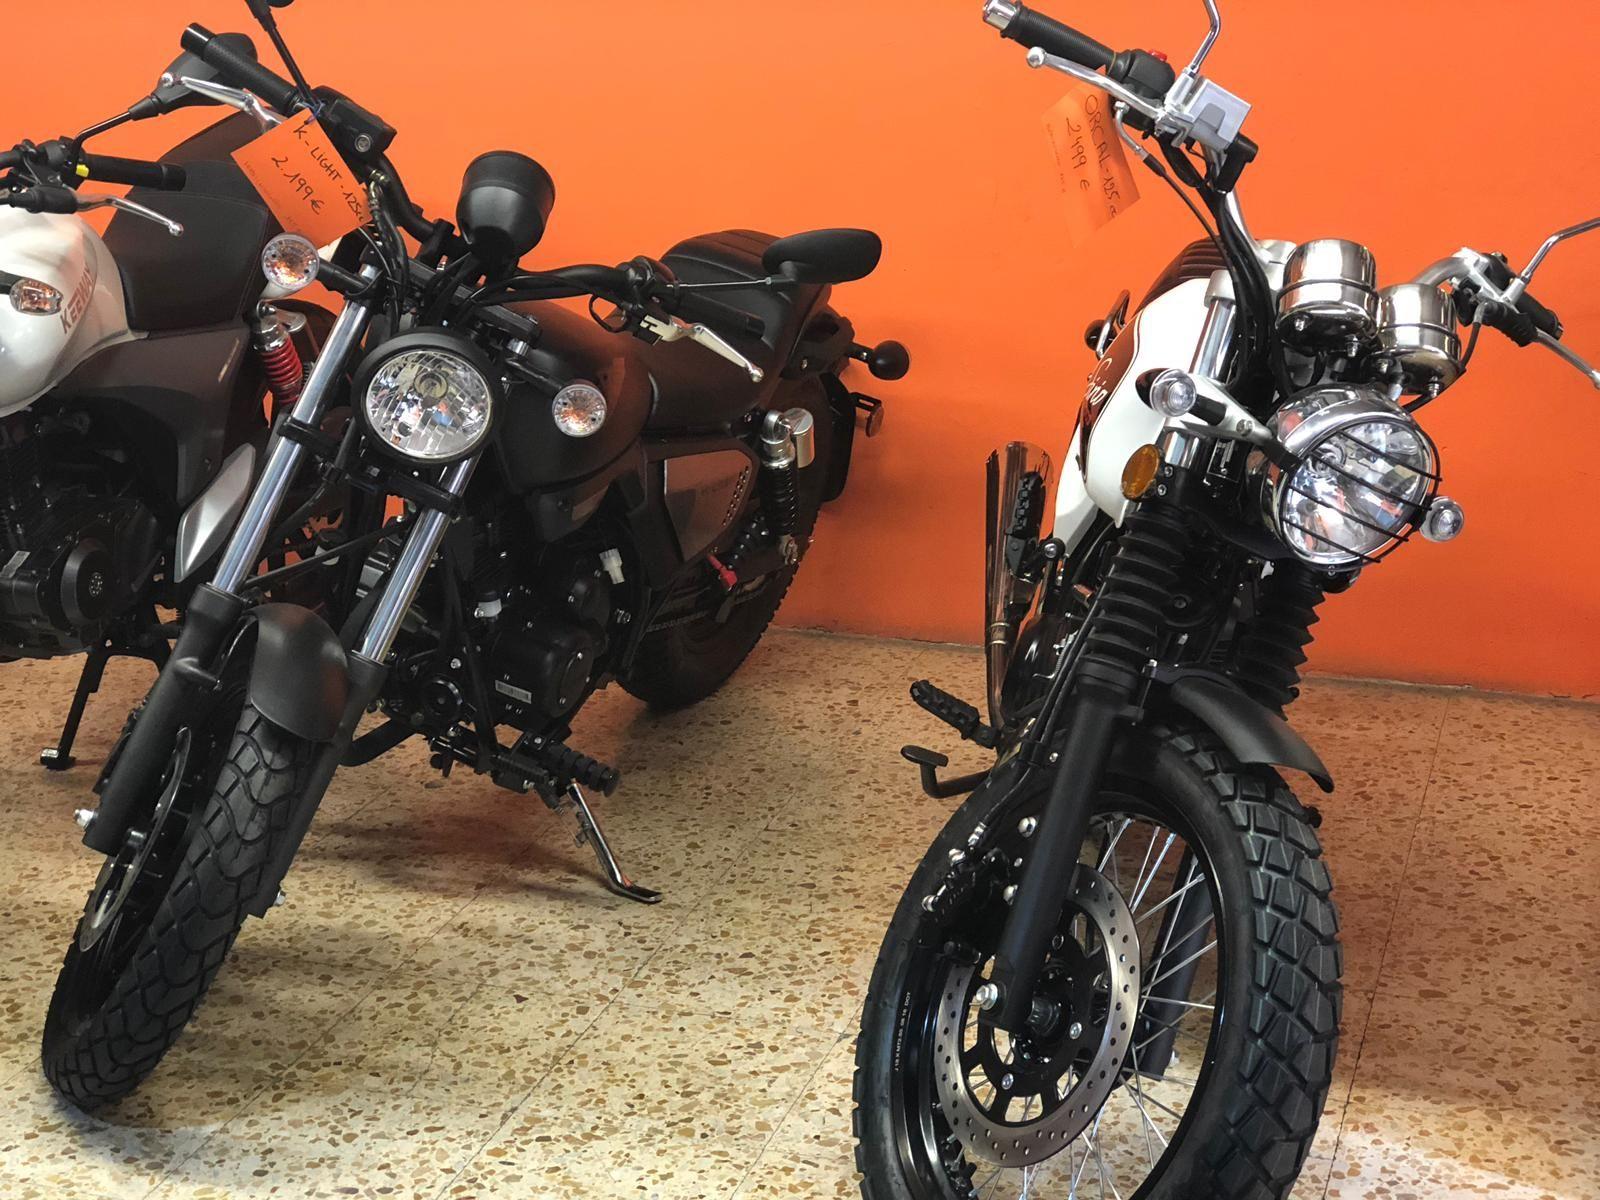 Reparación de motos Lleida